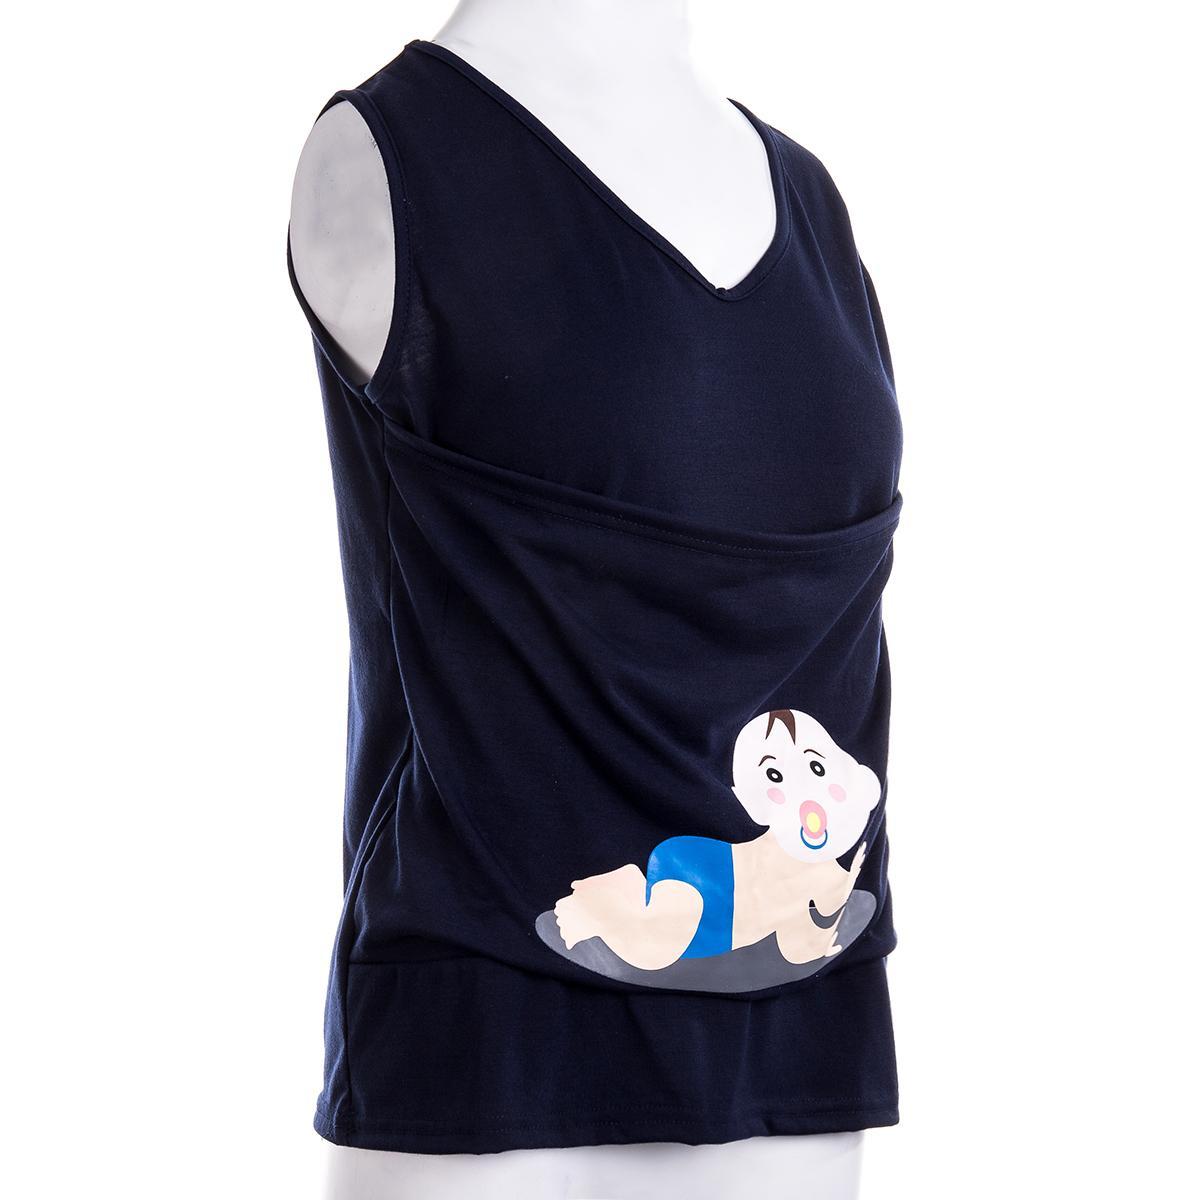 Fashion Women Maternity Solid Kangaroo Pocket Sleeveless Top Vest T Shirt Blouse